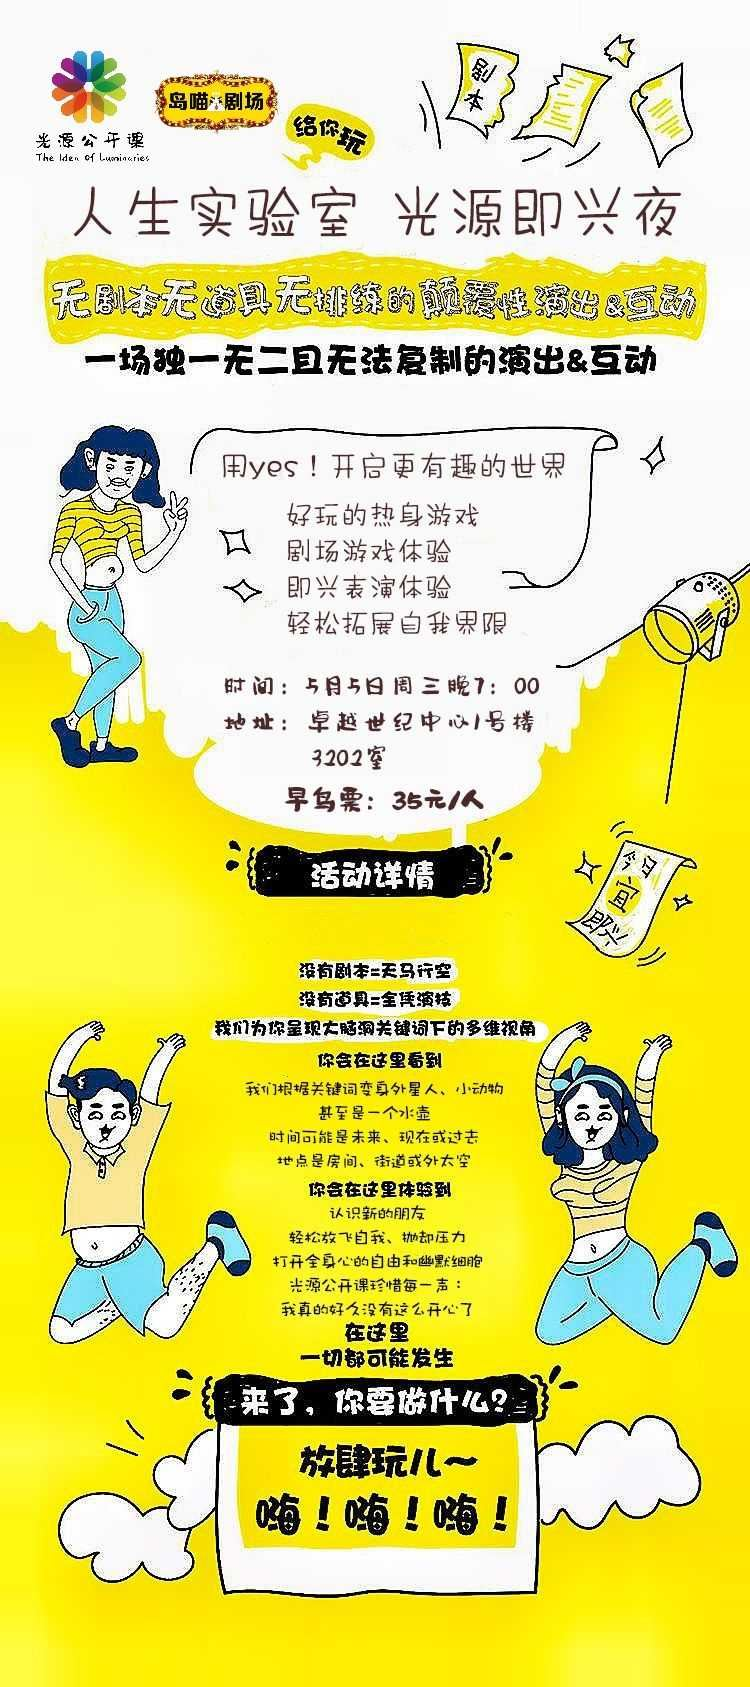 http://www.huodongxing.com/file/20210425/6194132550926/204132557144943.jpg